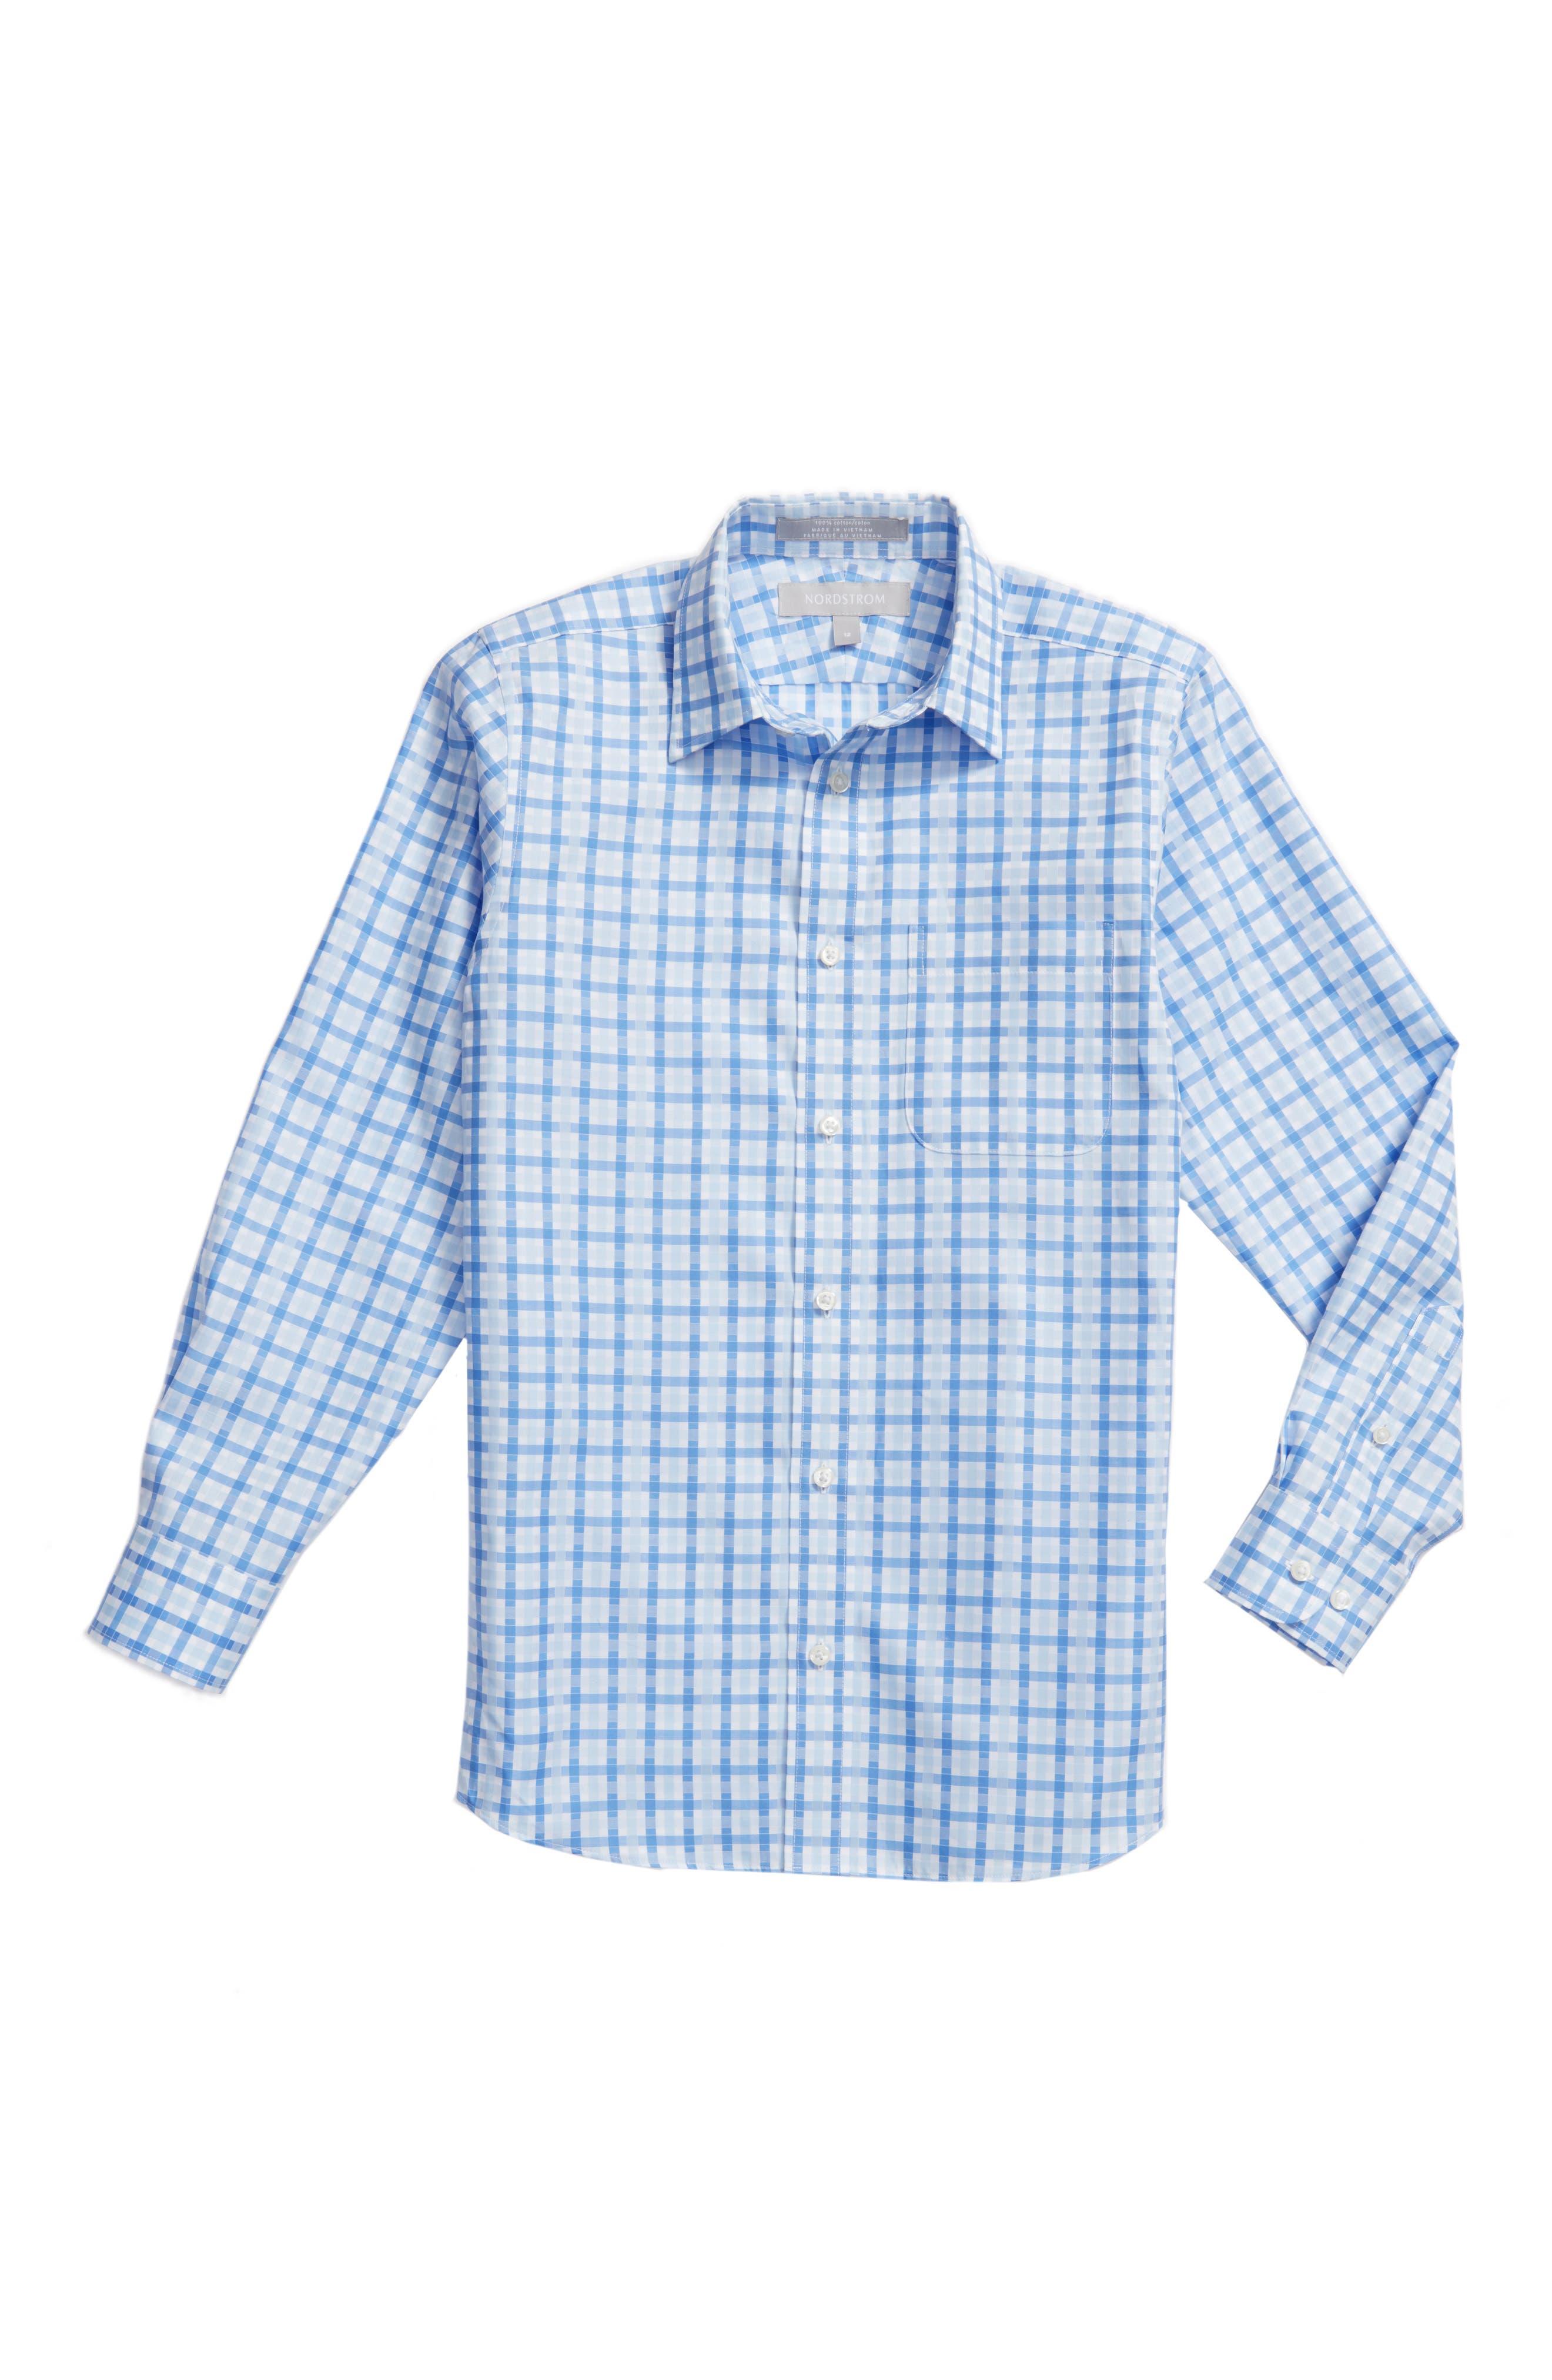 Nordstrom Kids Blue Haze Plaid Dress Shirt (Big Boys)